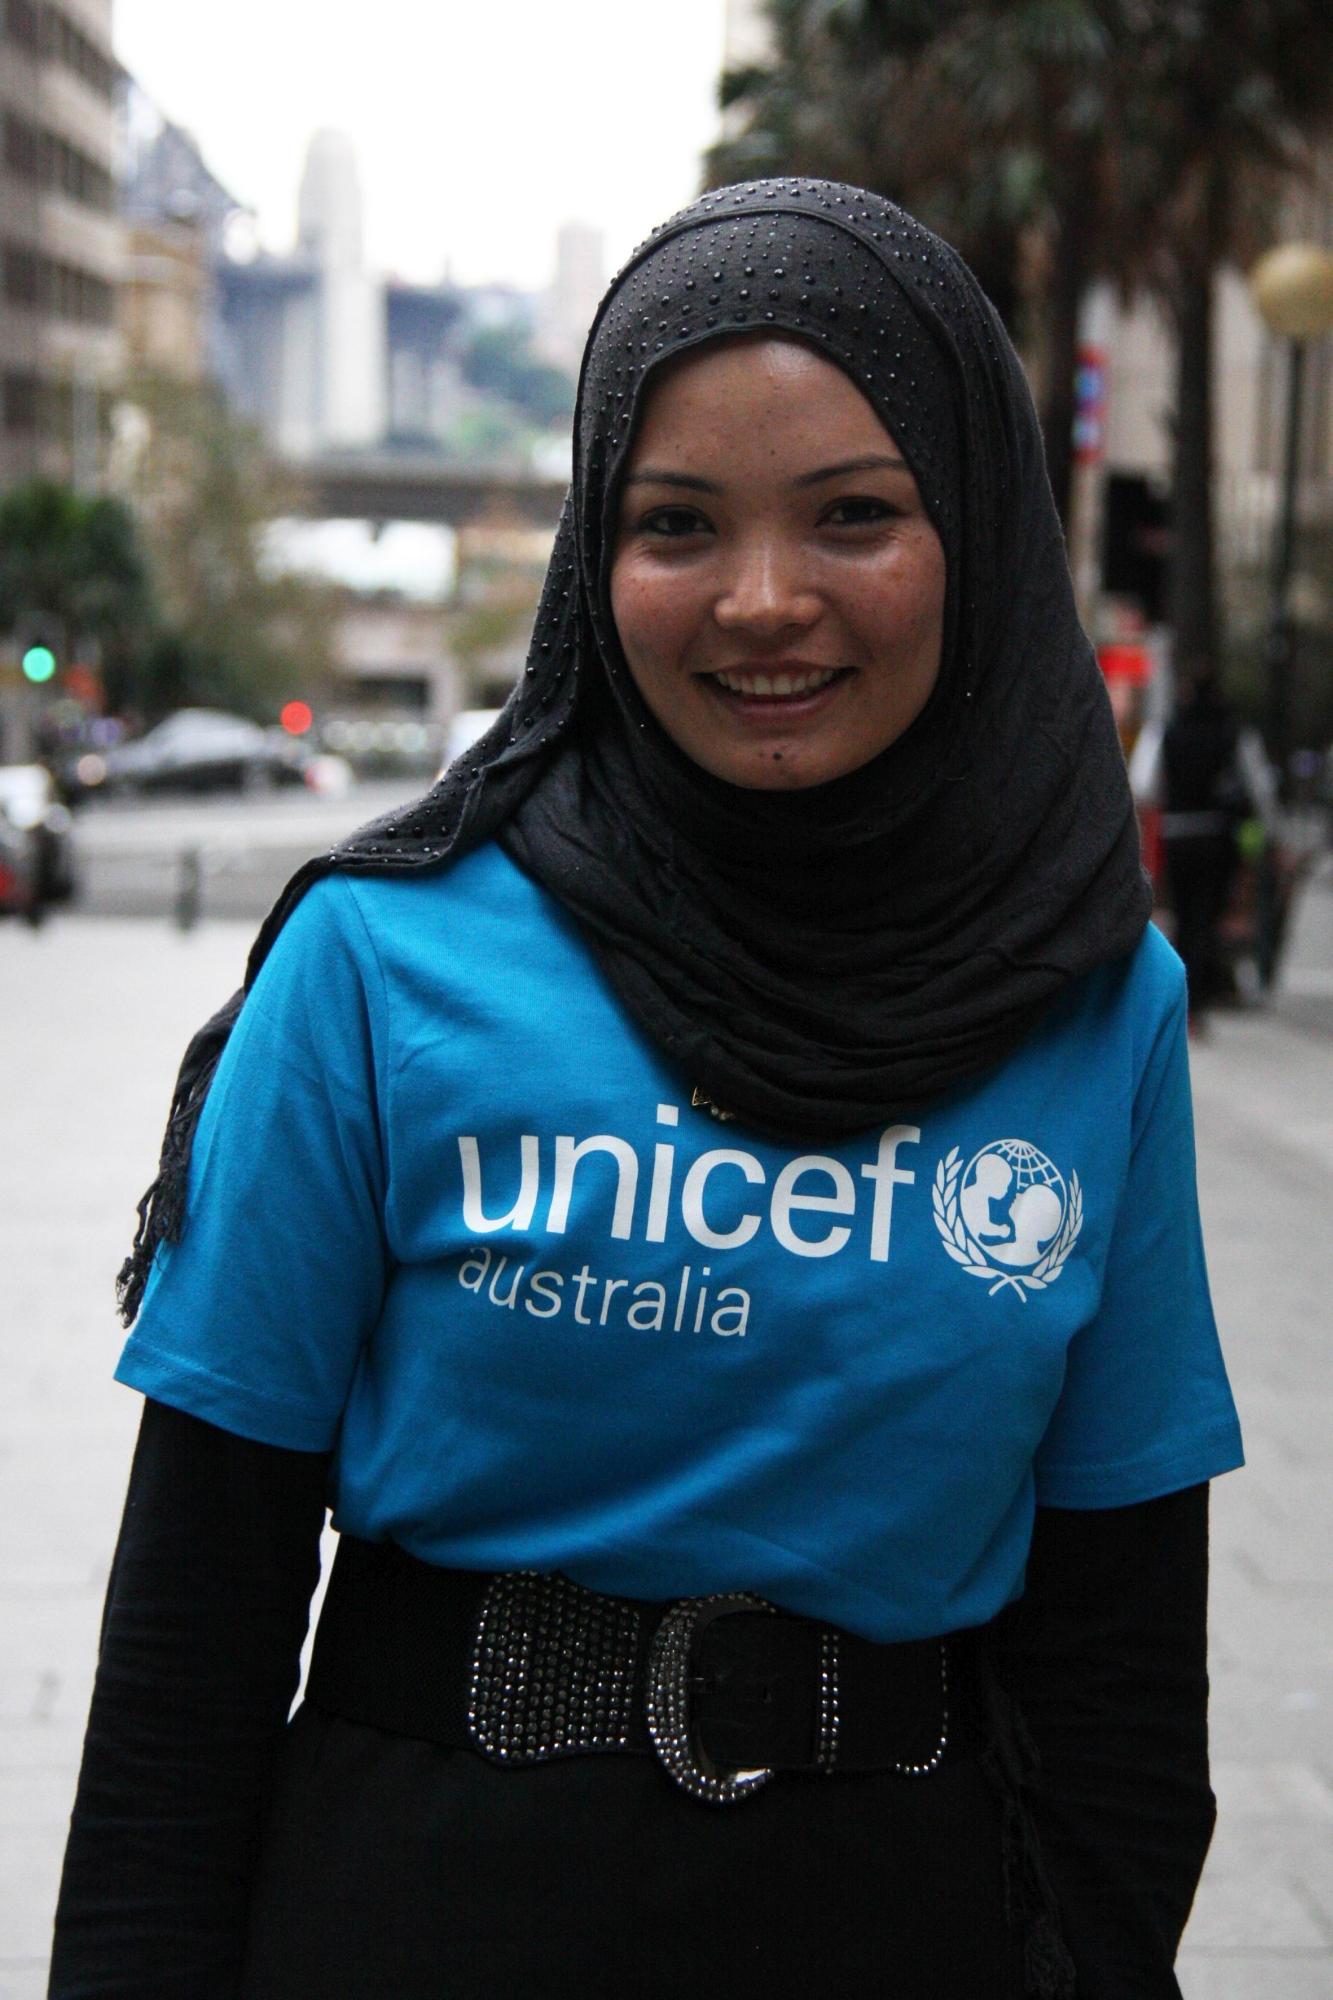 UNICEF Australia Young Ambassador Rahila Haidary.